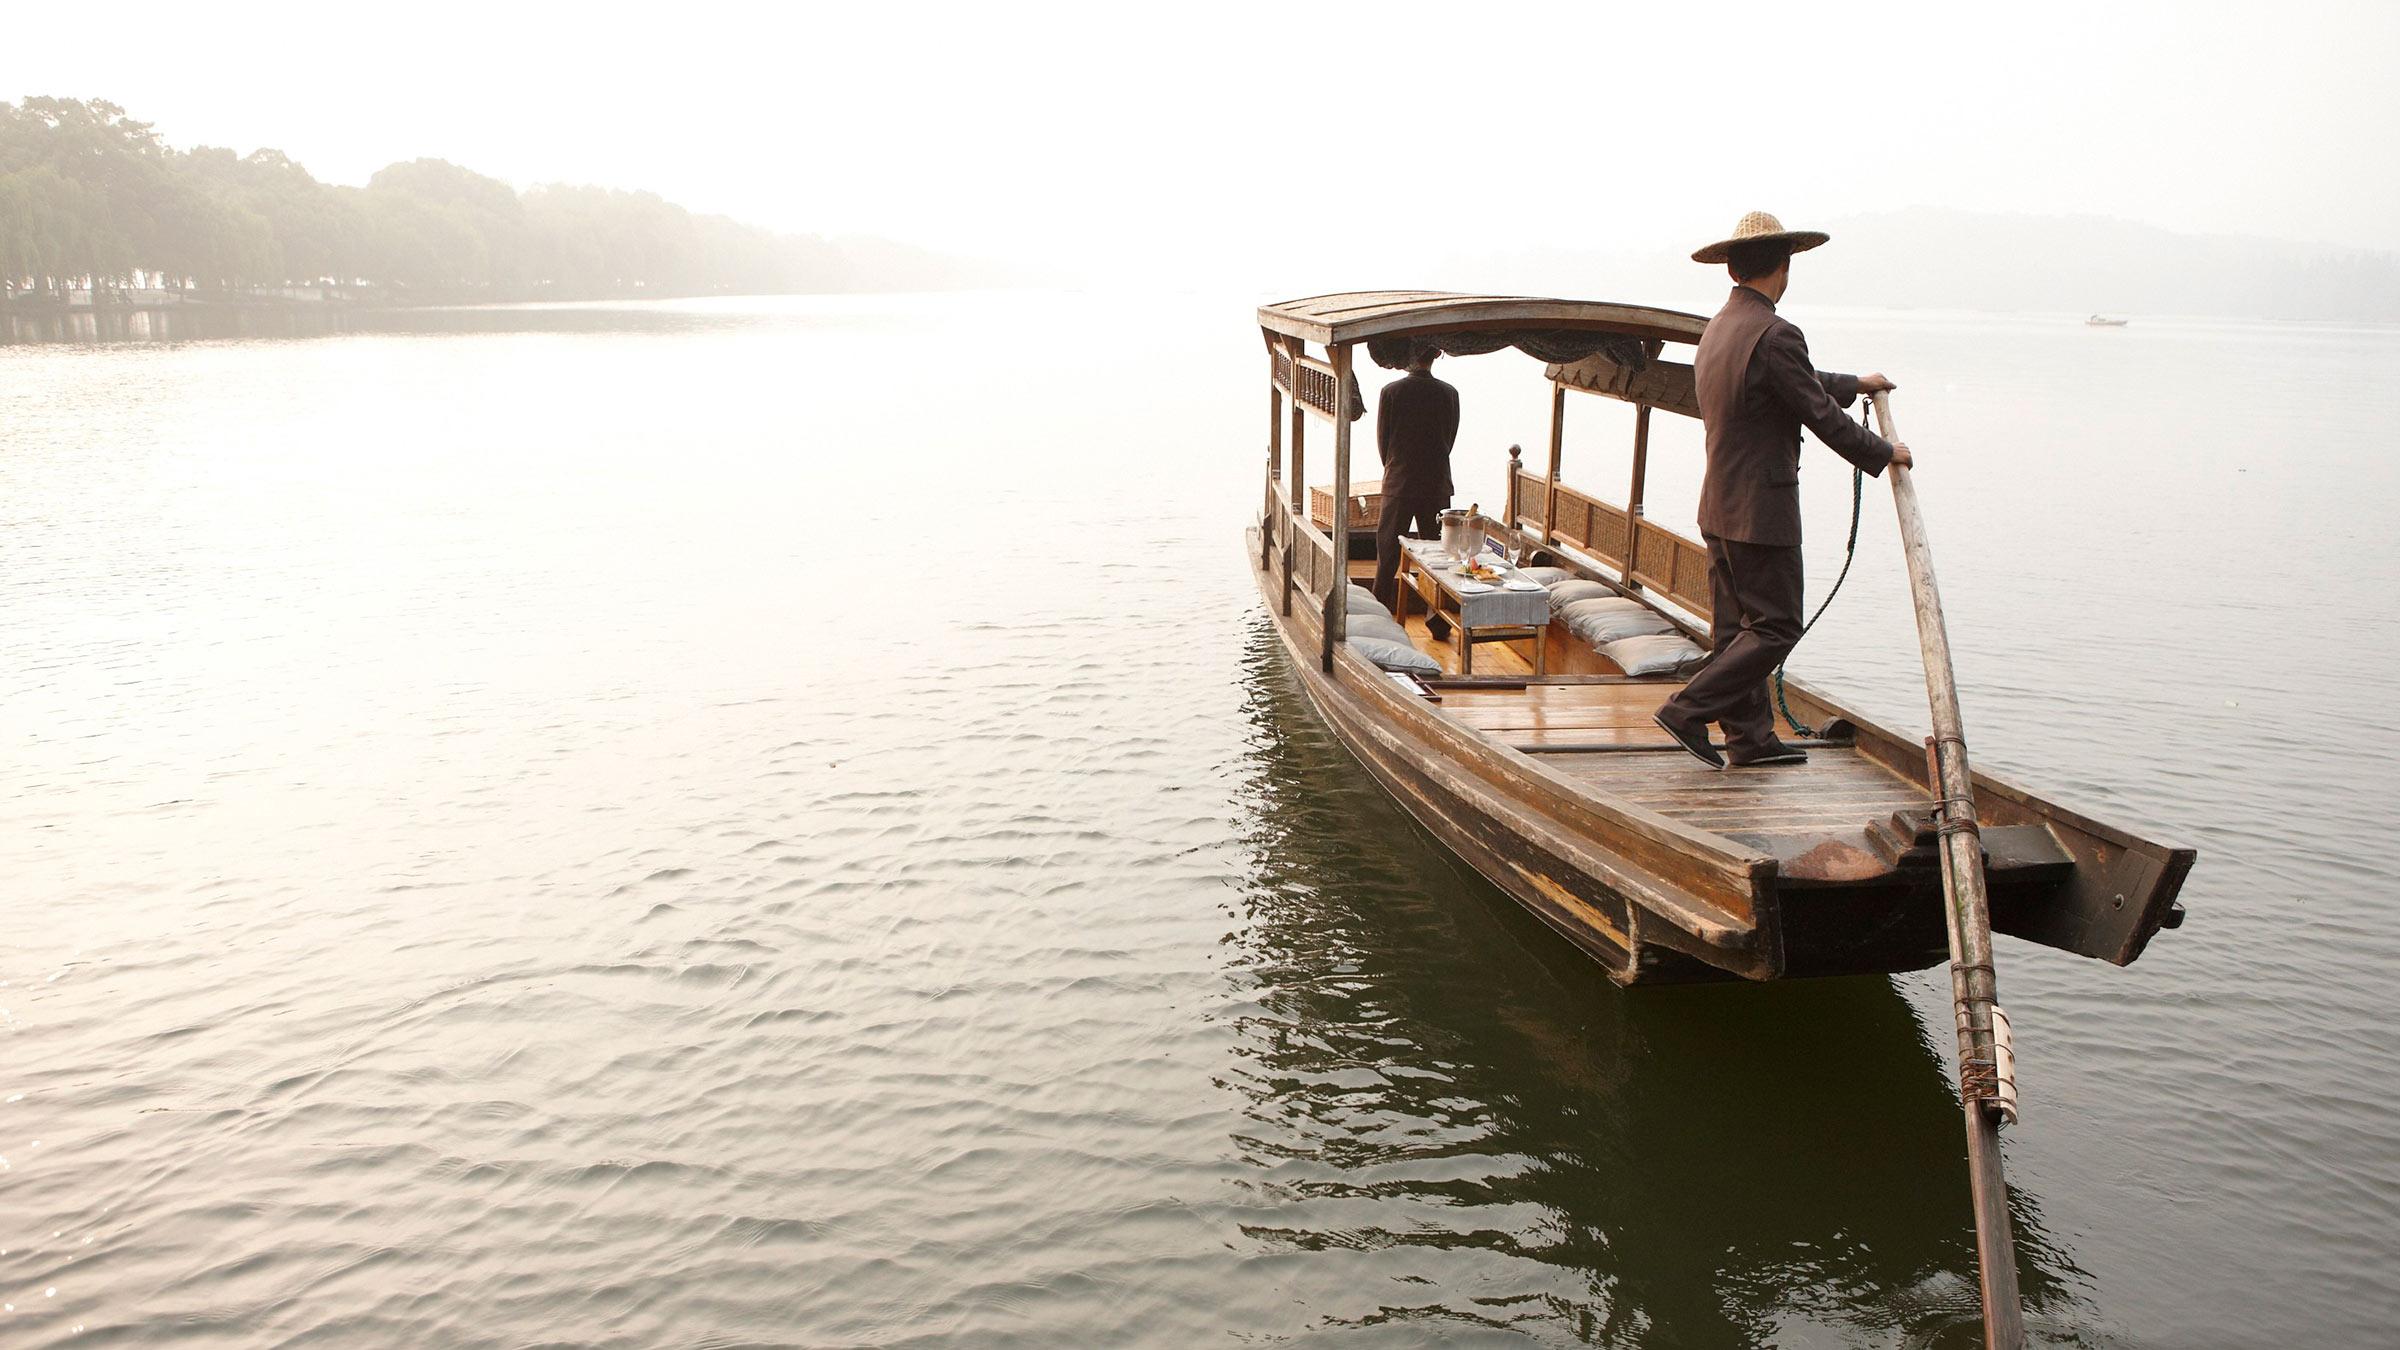 four-seasons-hangzhou-water-arrival-2400x1350.jpg